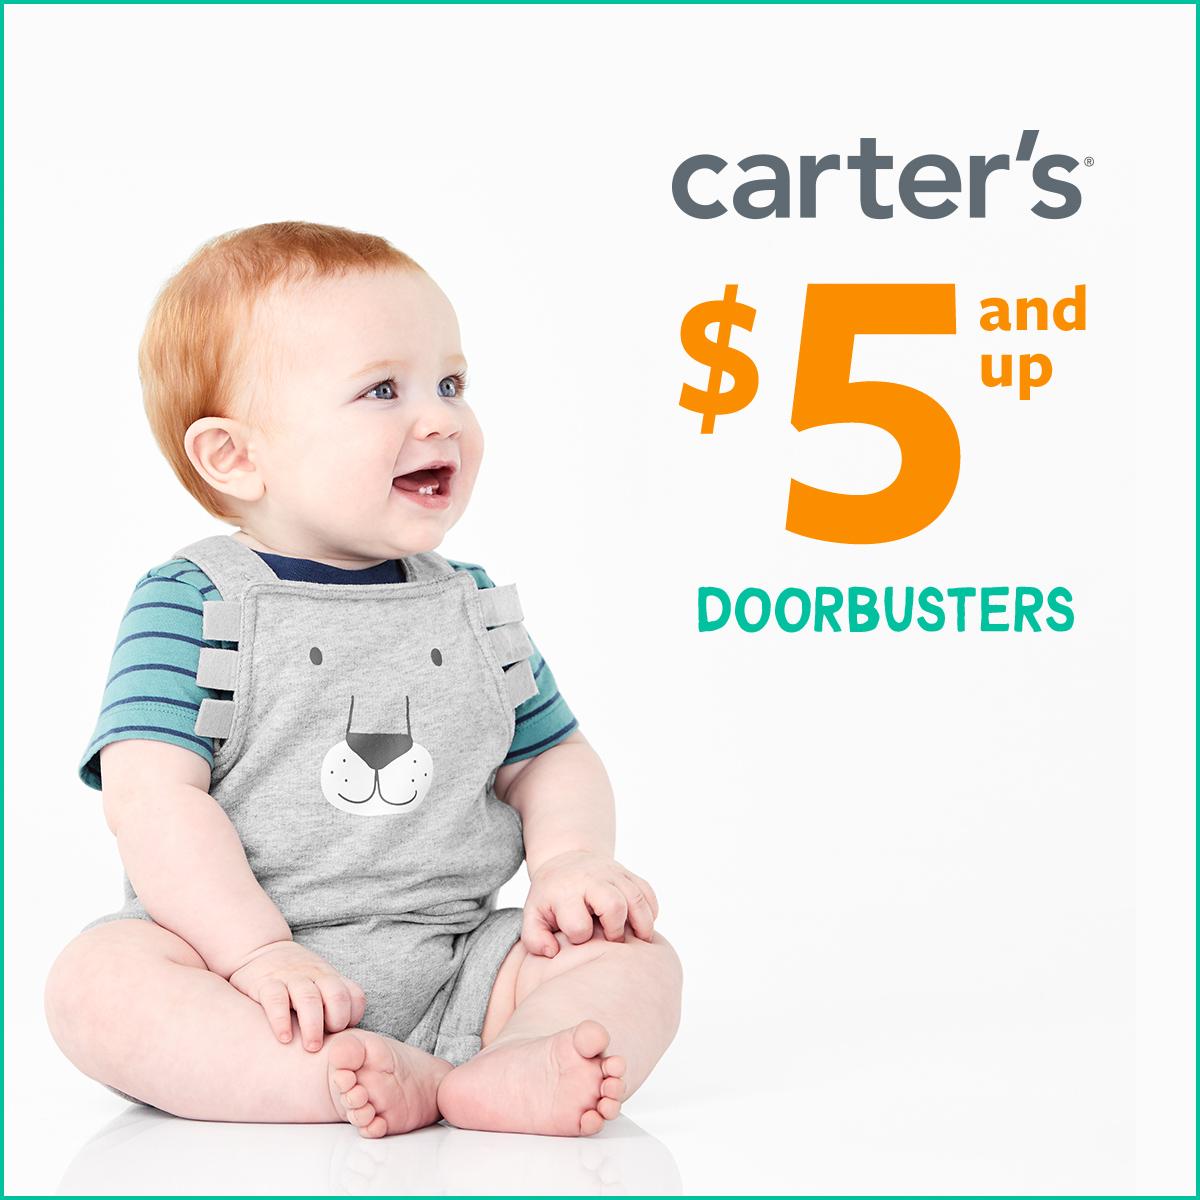 Carter's $5 and Up Doorbusters